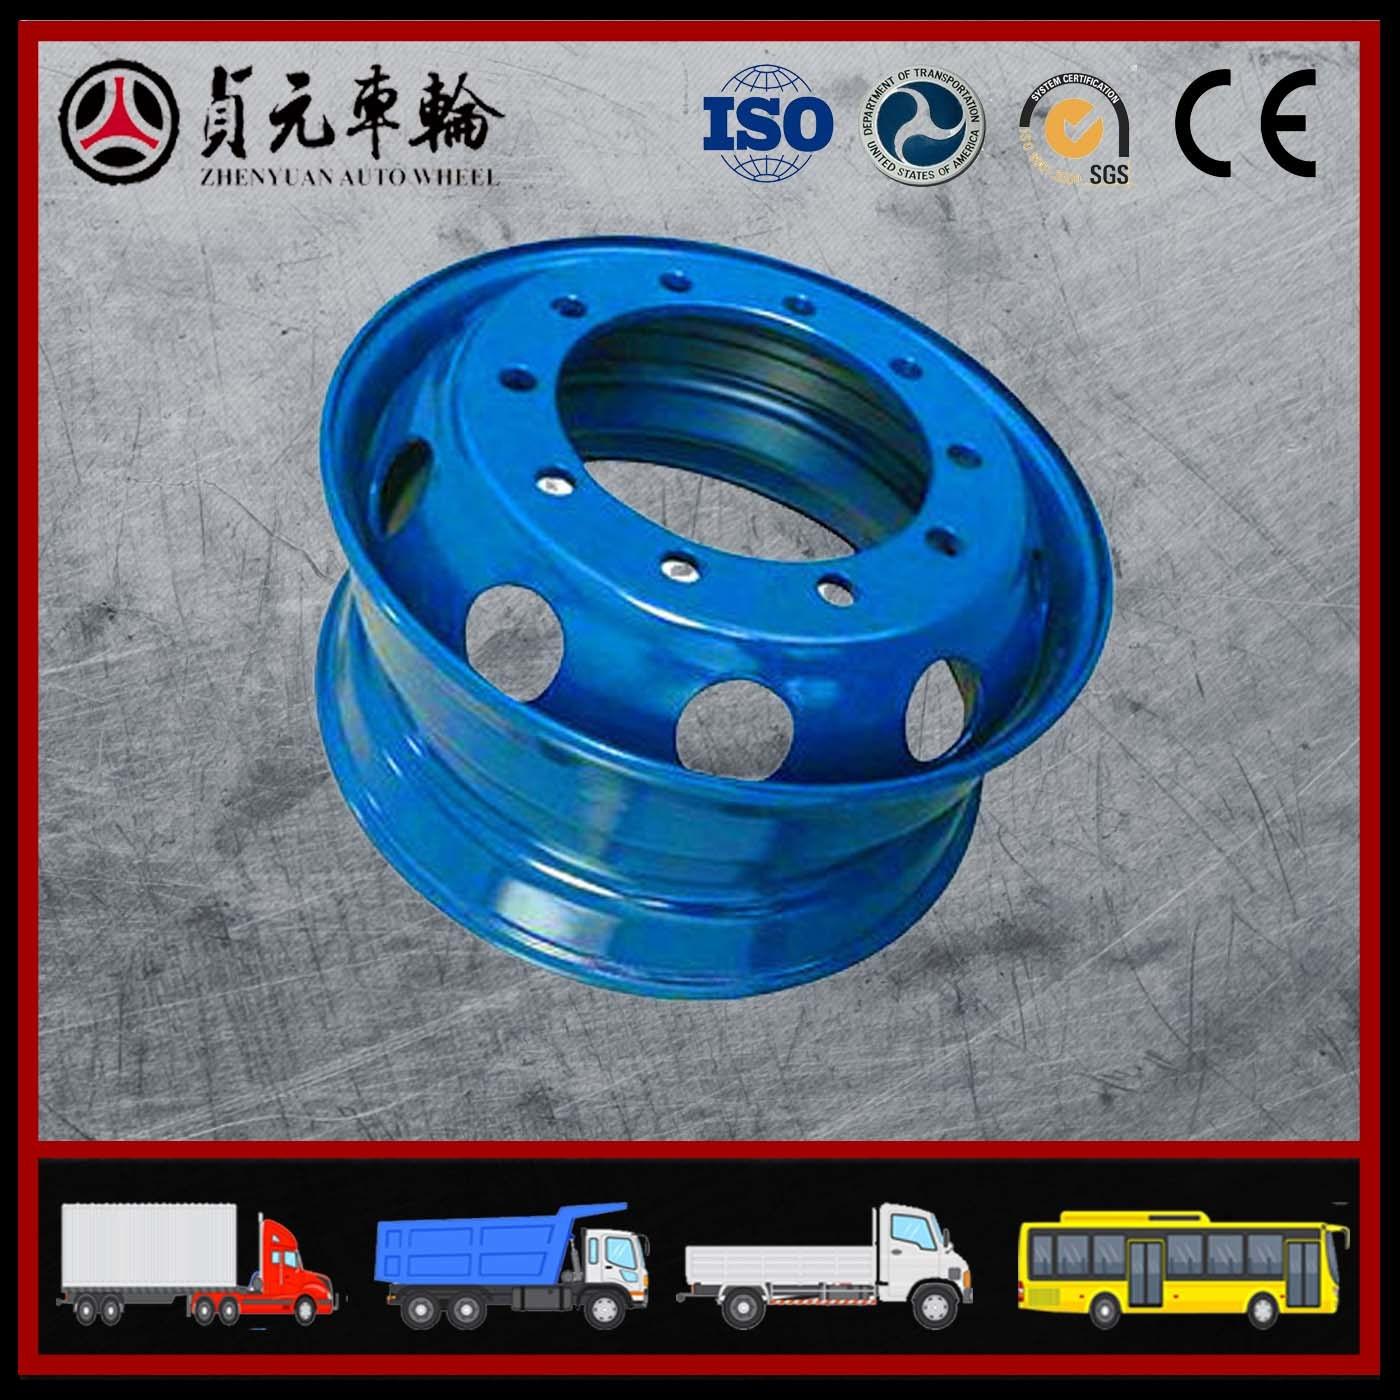 High Quality Trailer Wheel Rims for Zhenyuan Wheel (17.5*6.0)